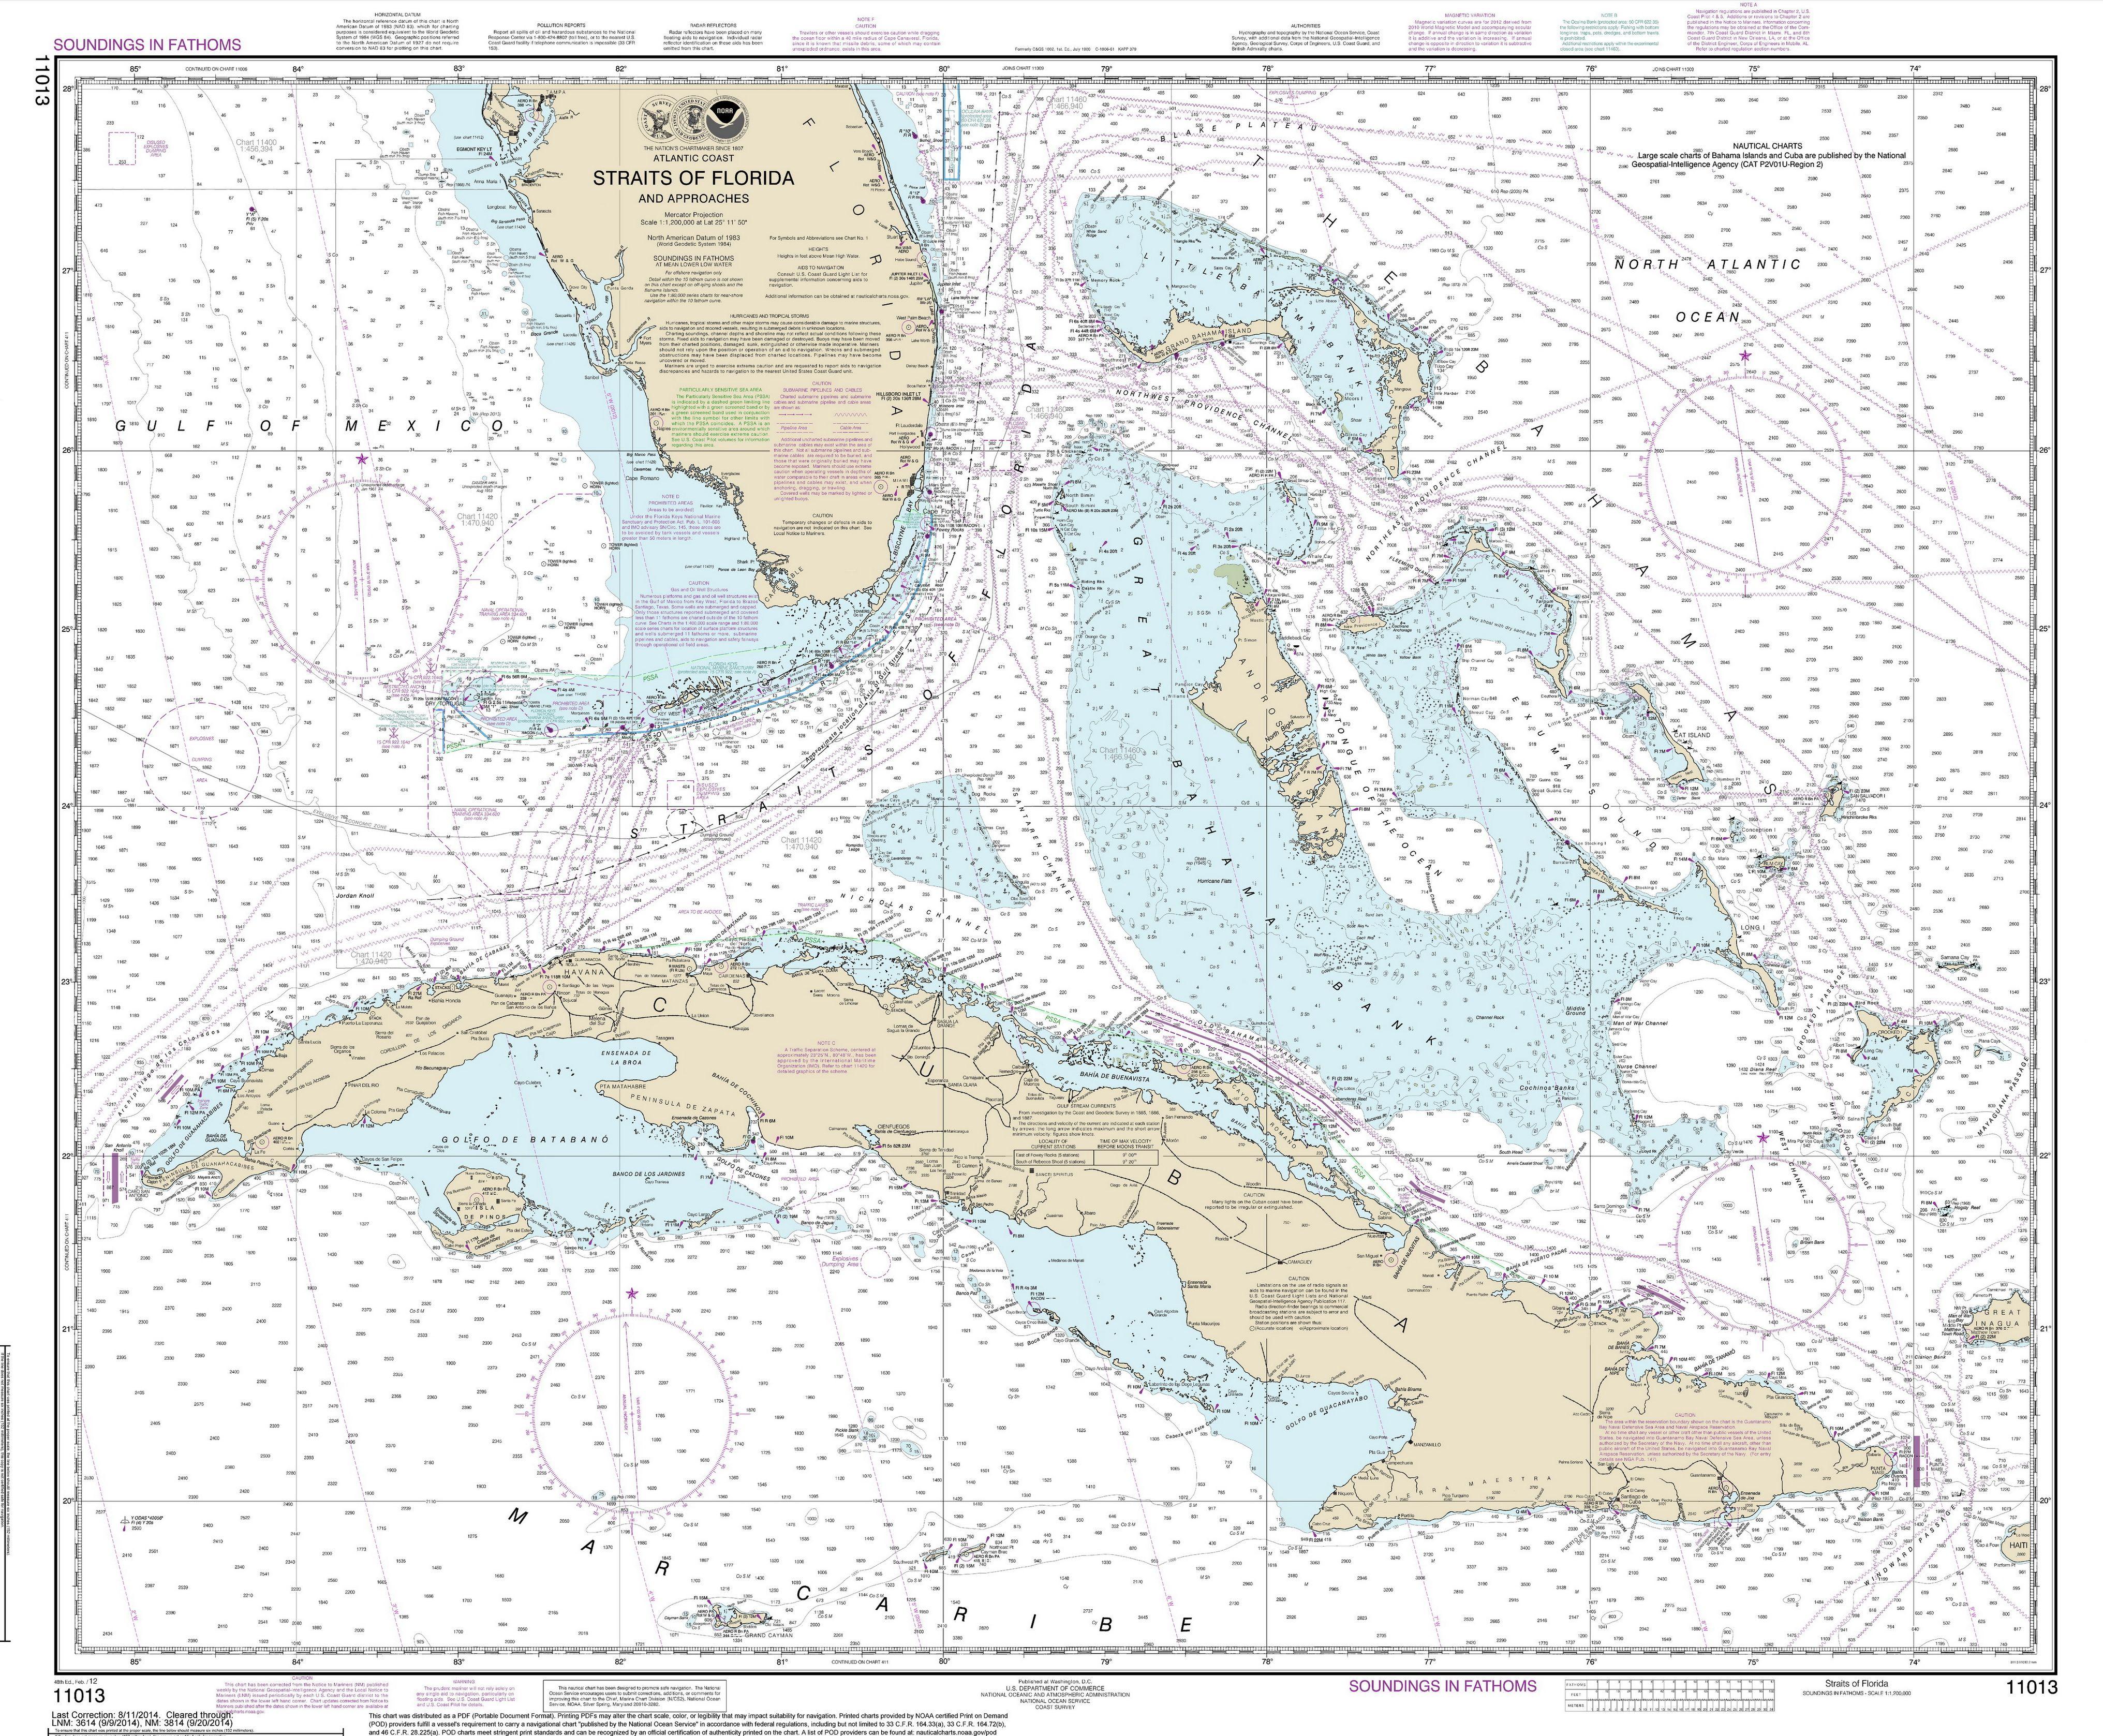 Modern Nautical Maps Of Florida - 1:400,000 Scale Nautical Charts - Nautical Maps Florida